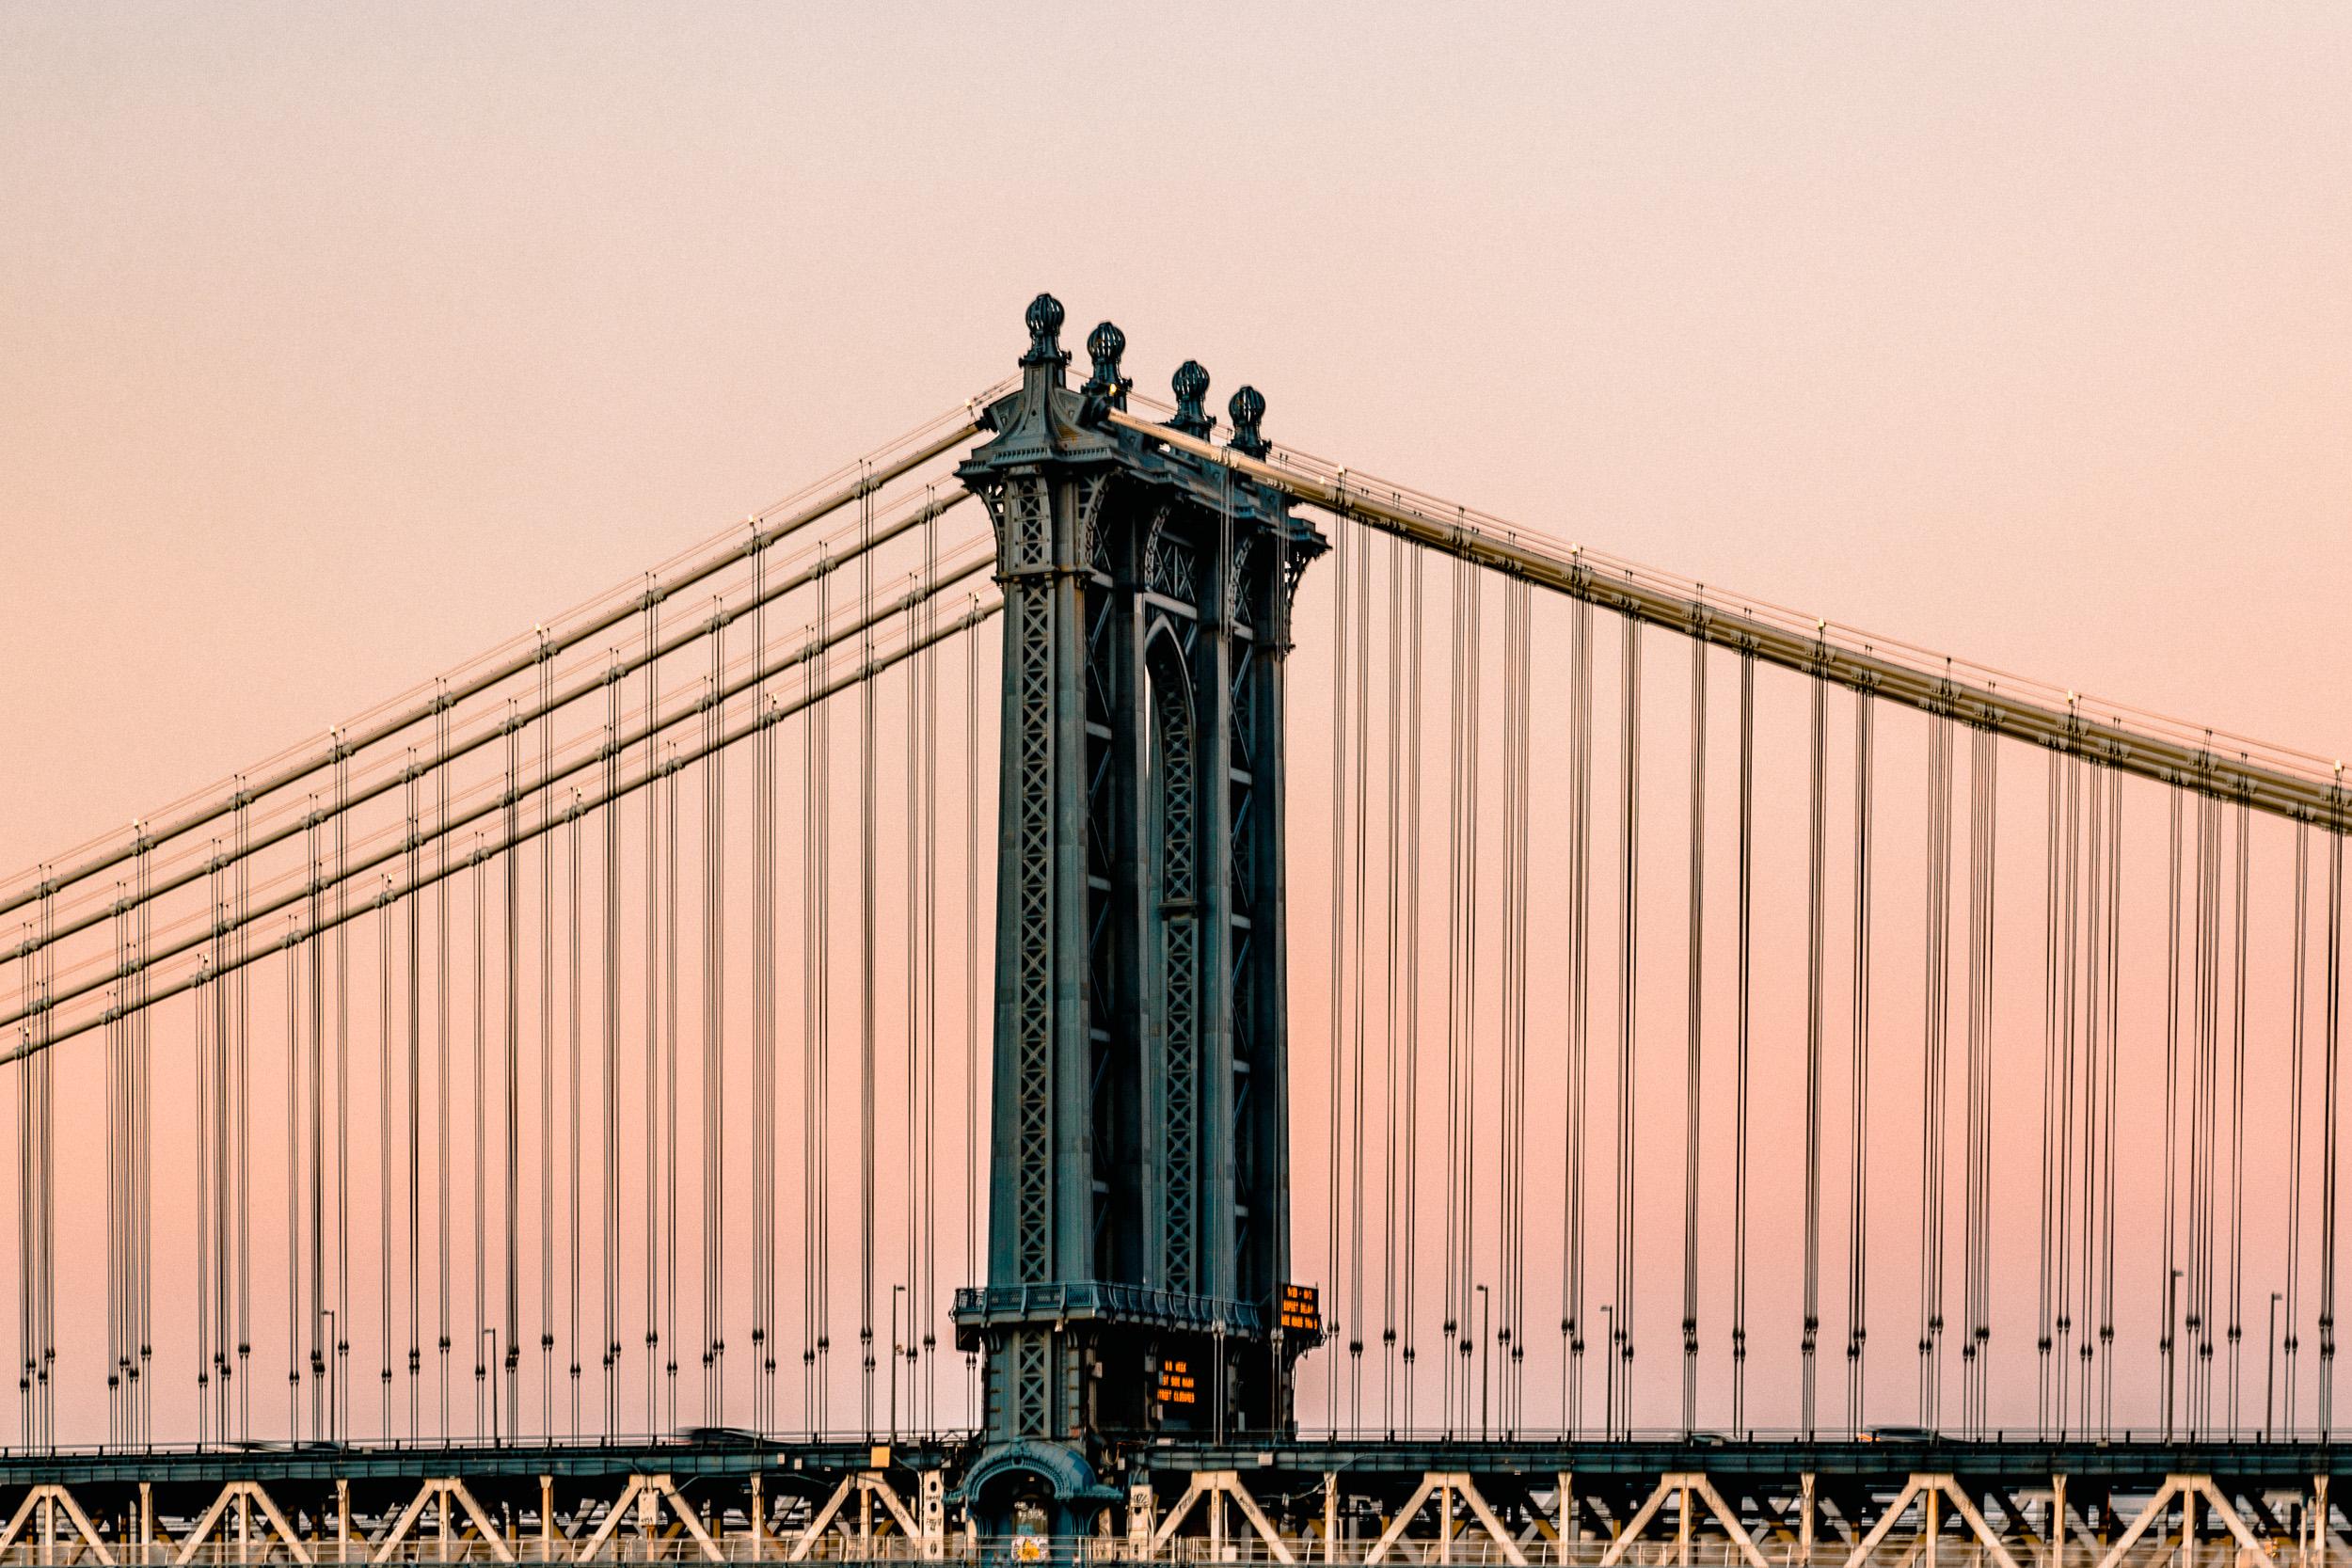 06-manhattan-bridge-nyc-sunset-new-york-city-anna-elina-lahti-photographer.jpg